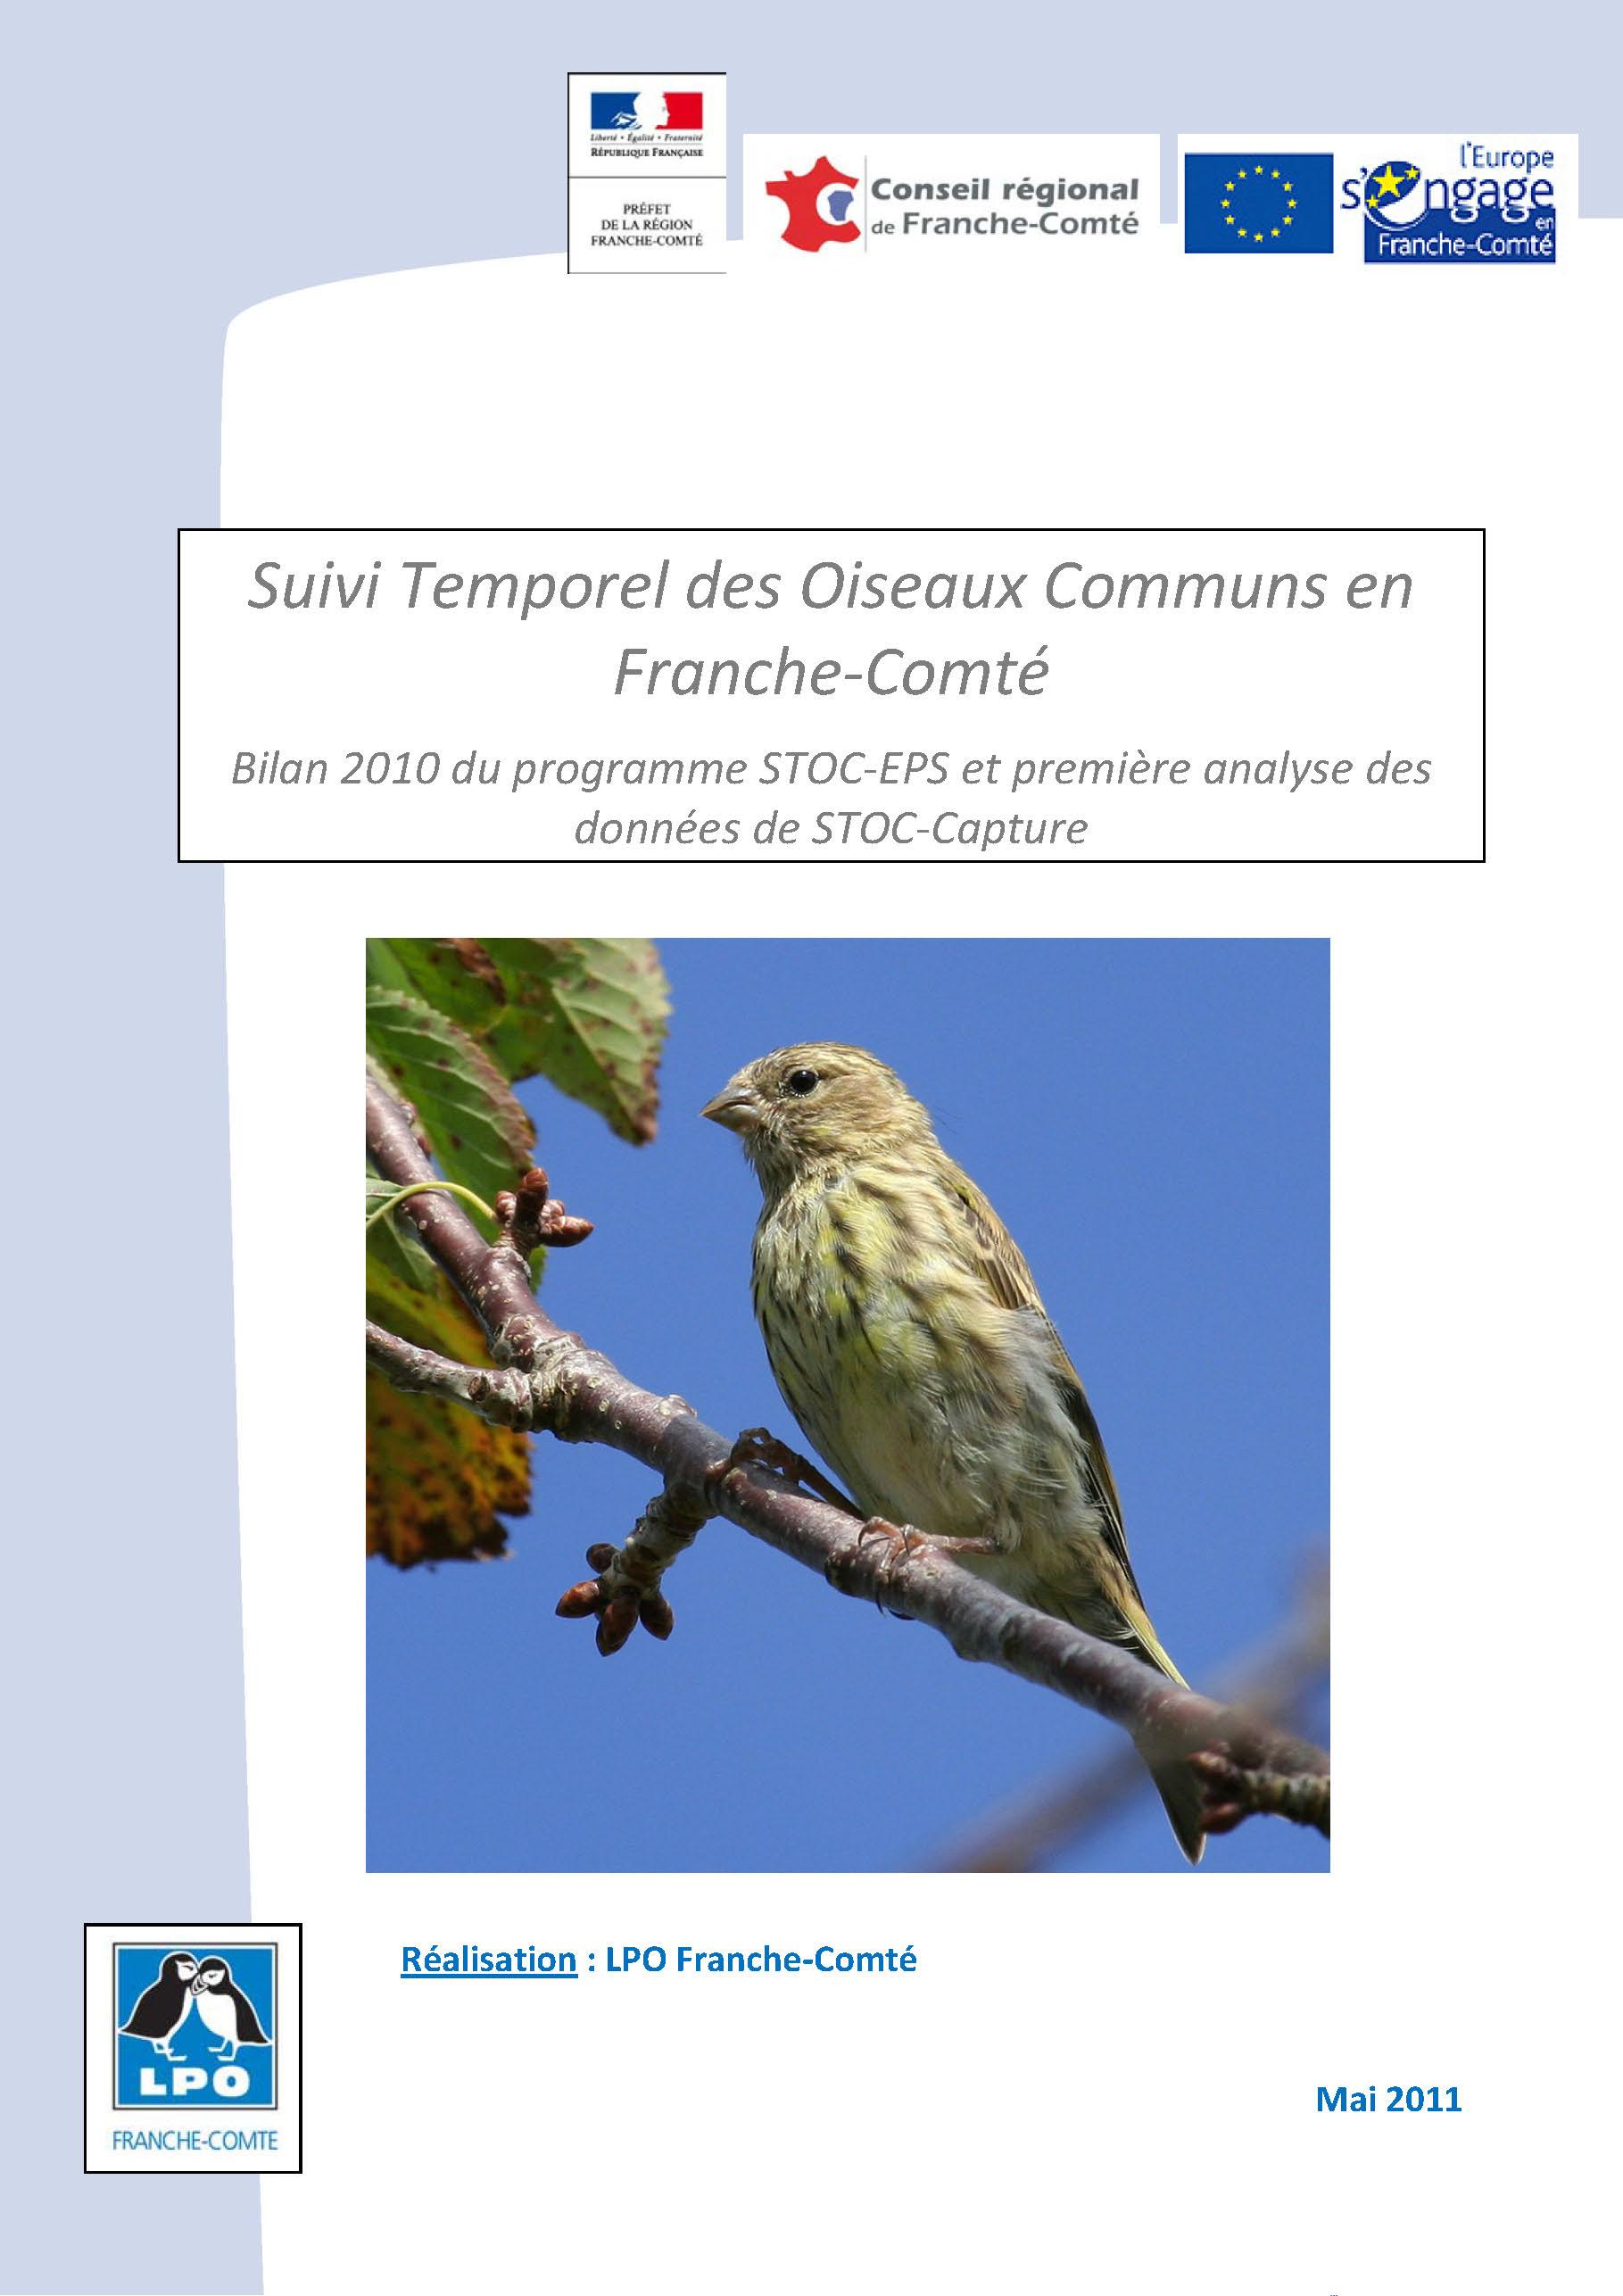 https://cdnfiles1.biolovision.net/franche-comte.lpo.fr/userfiles/observer/STOC/BilanSTOC2010web.pdf